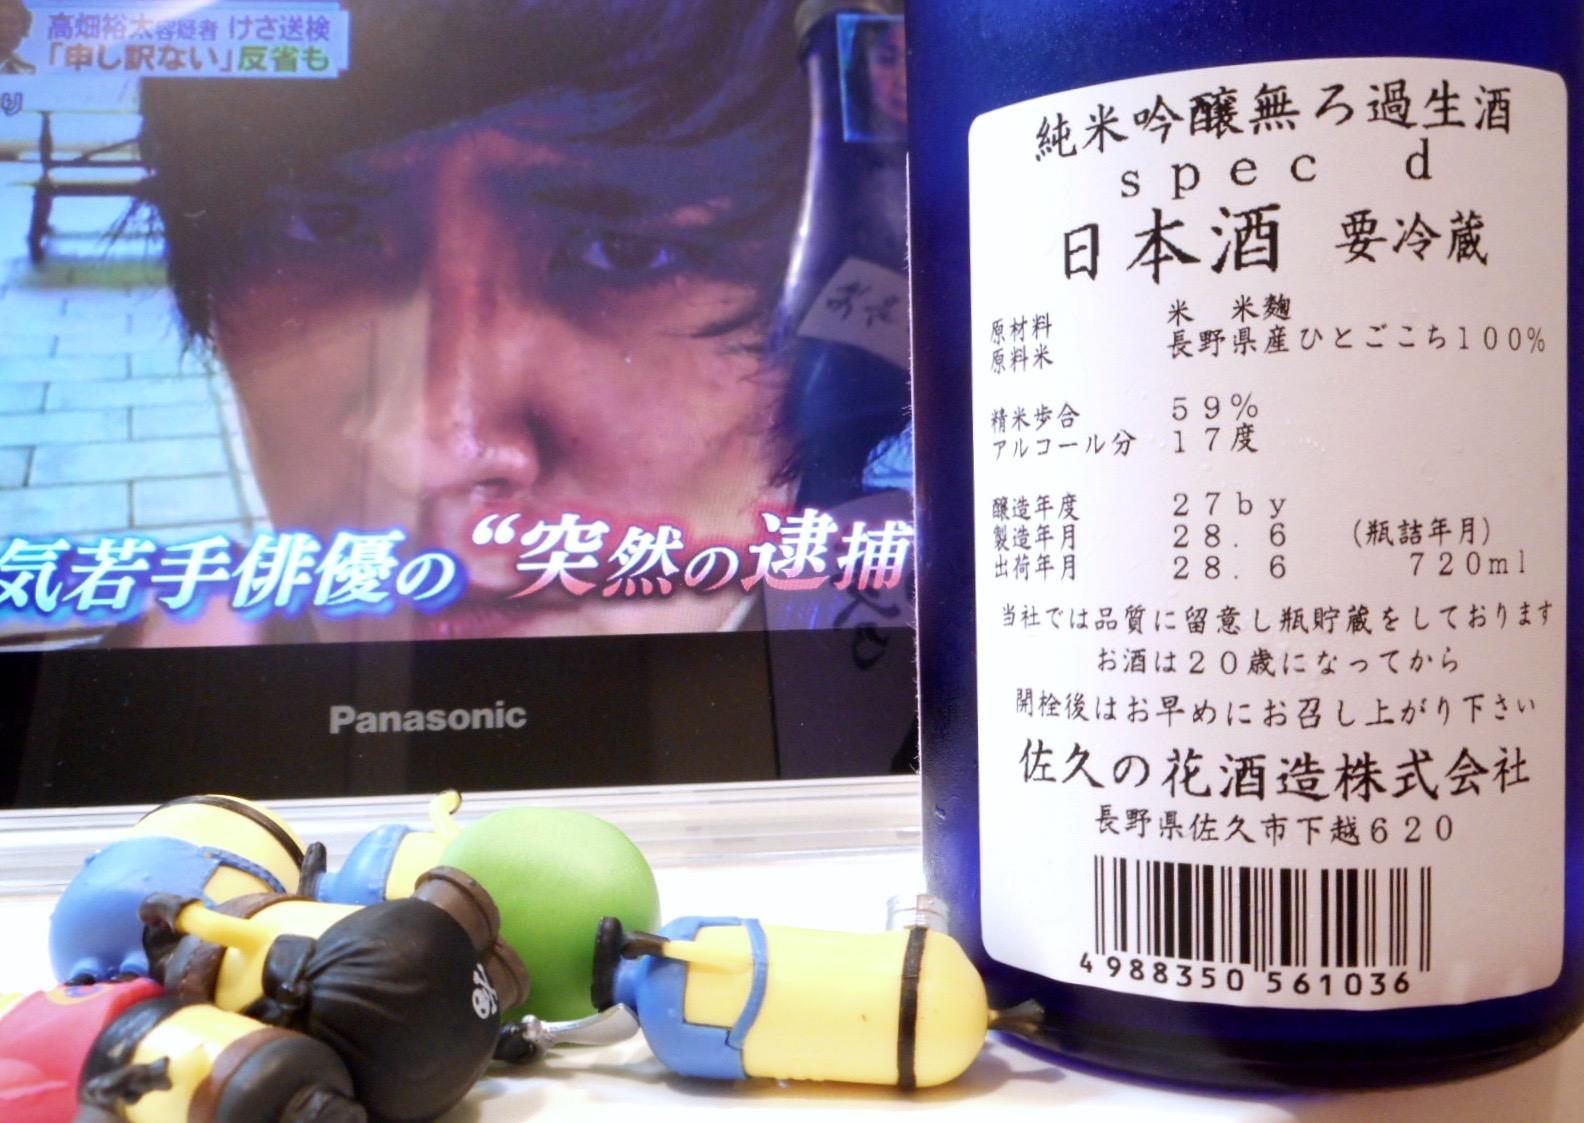 sakunohana_spec_d27by2.jpg